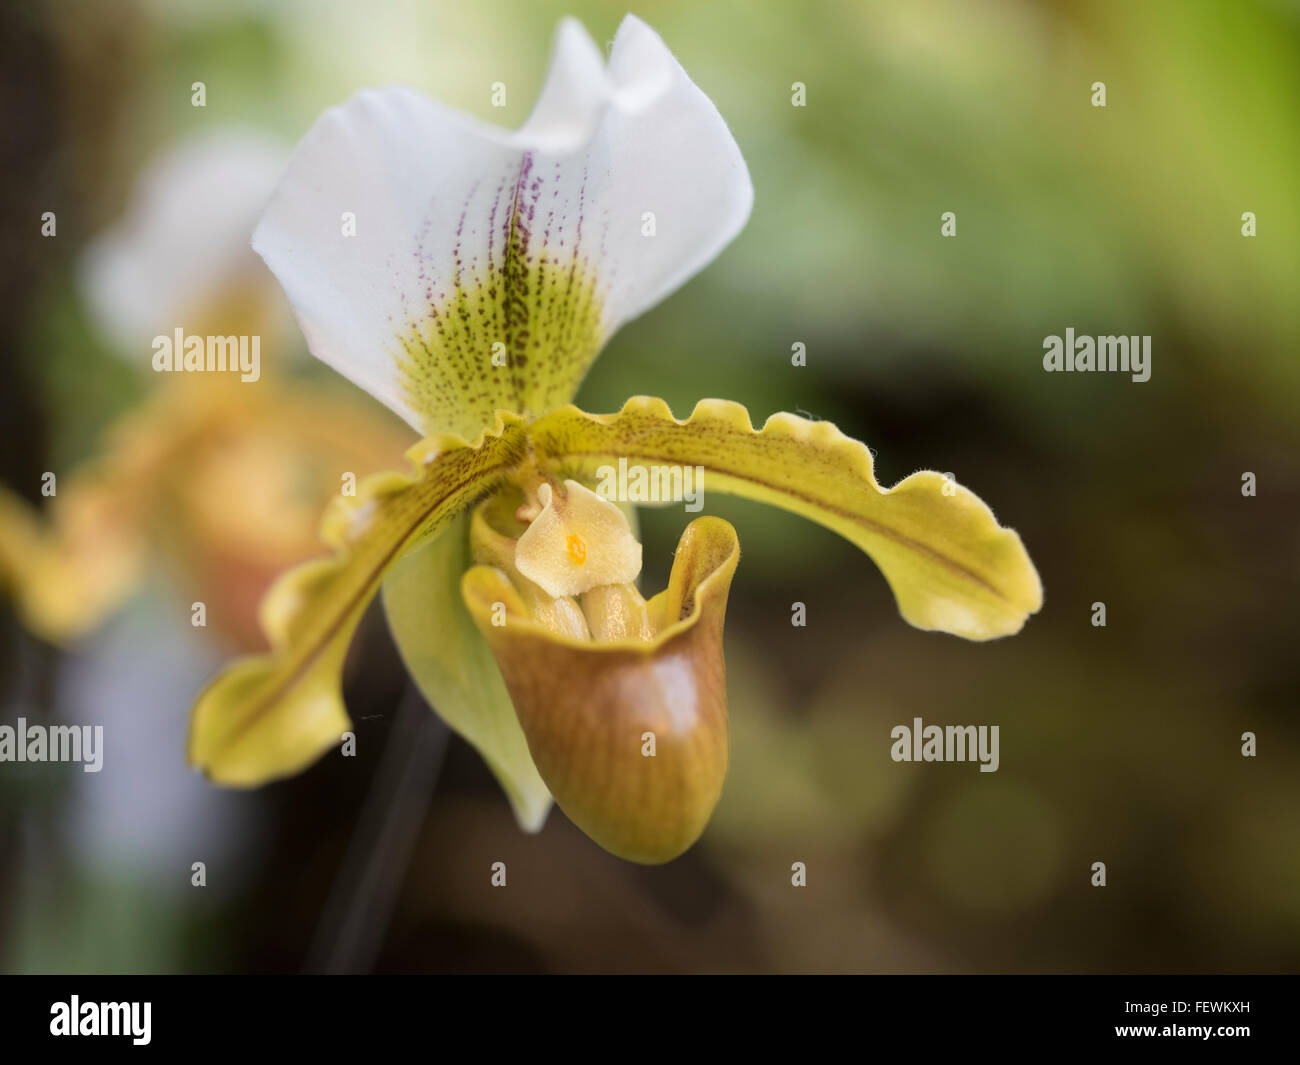 Paphiopedilum Leeanum Orchideen am internationalen Orchideen Festival, Expo Park, Okinawa Stockbild